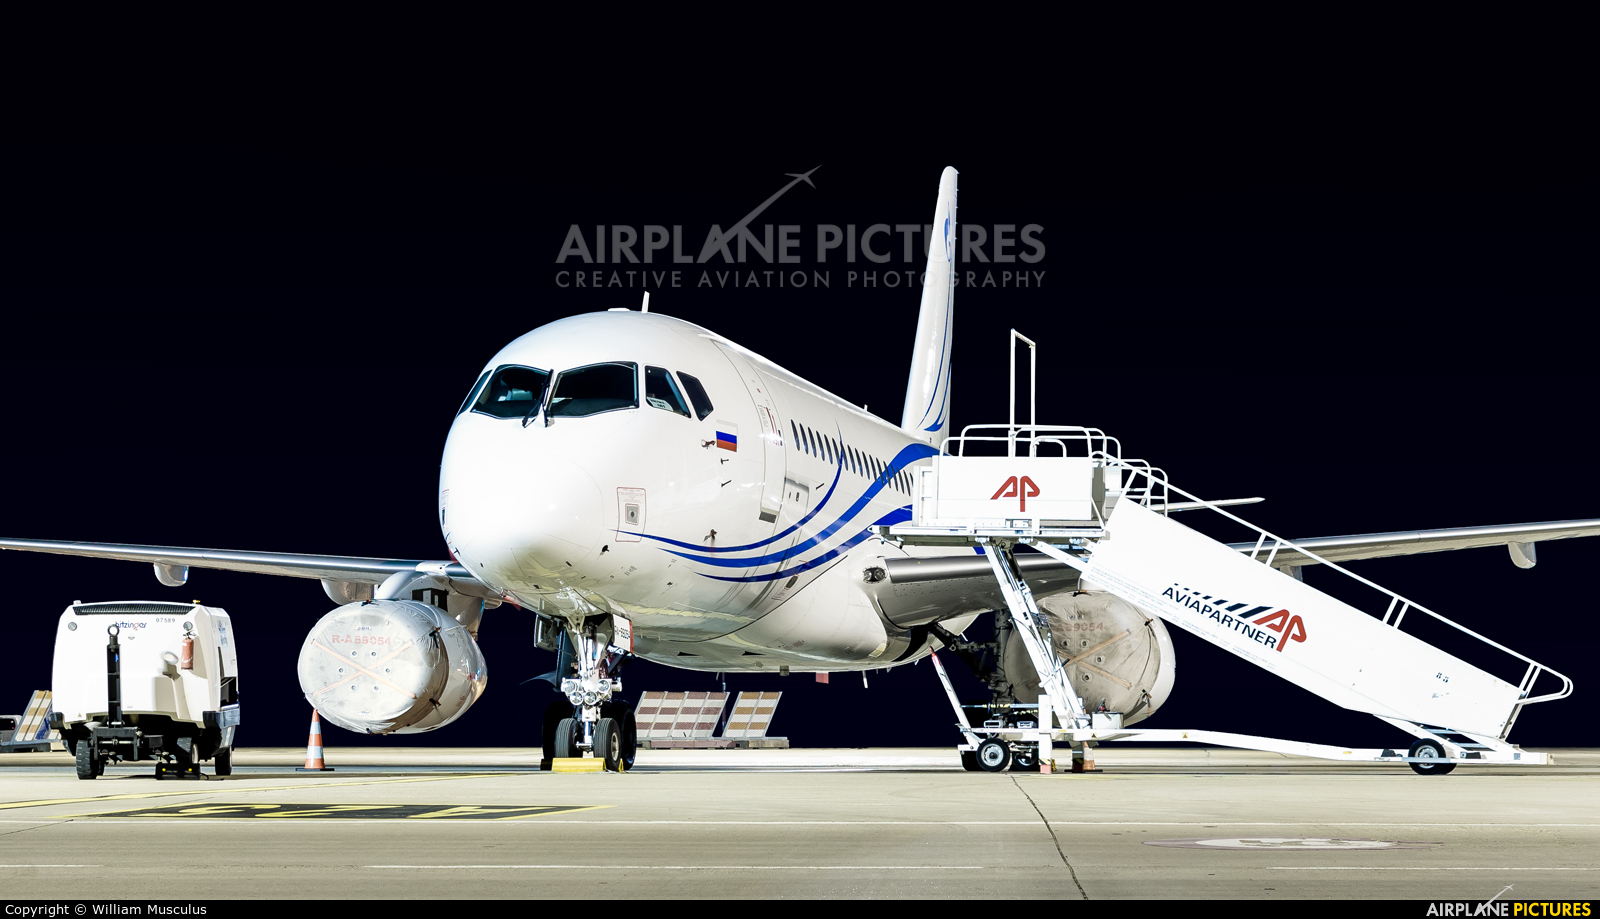 Gazpromavia RA-89054 aircraft at Strasbourg-Entzheim